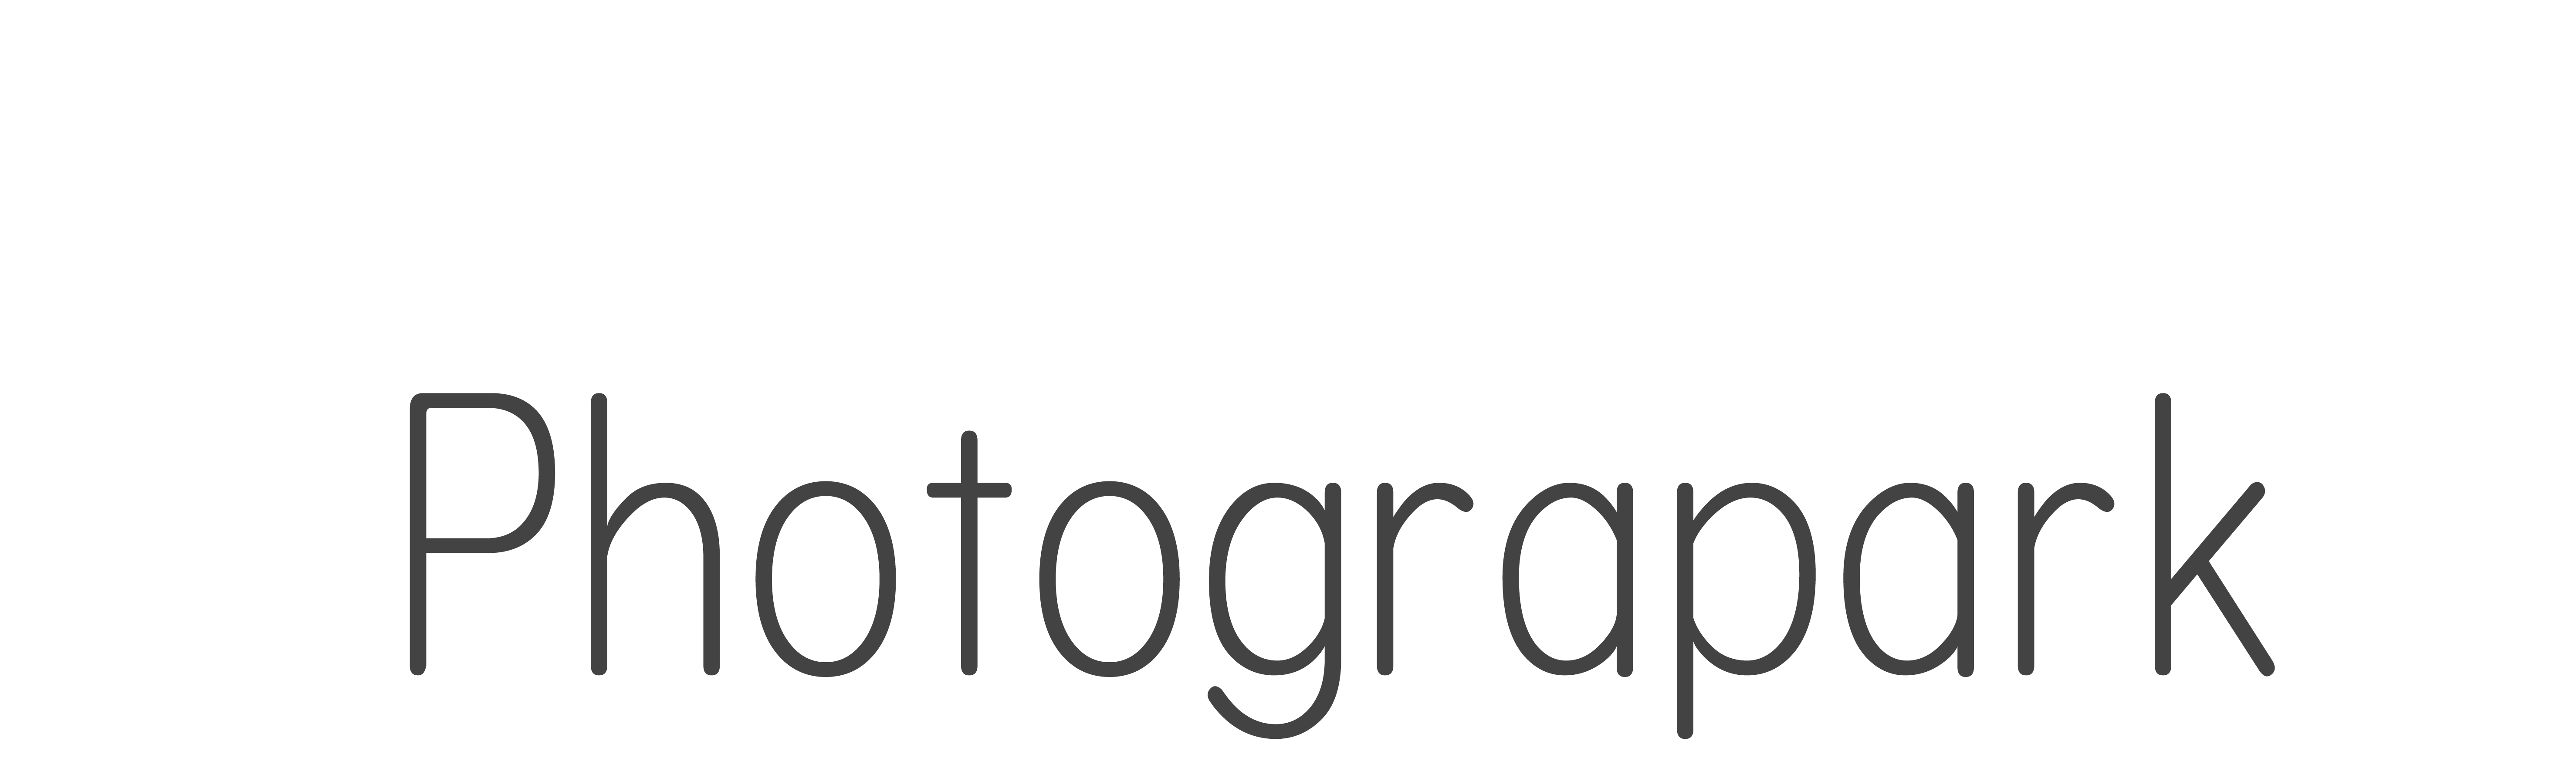 Photograpark